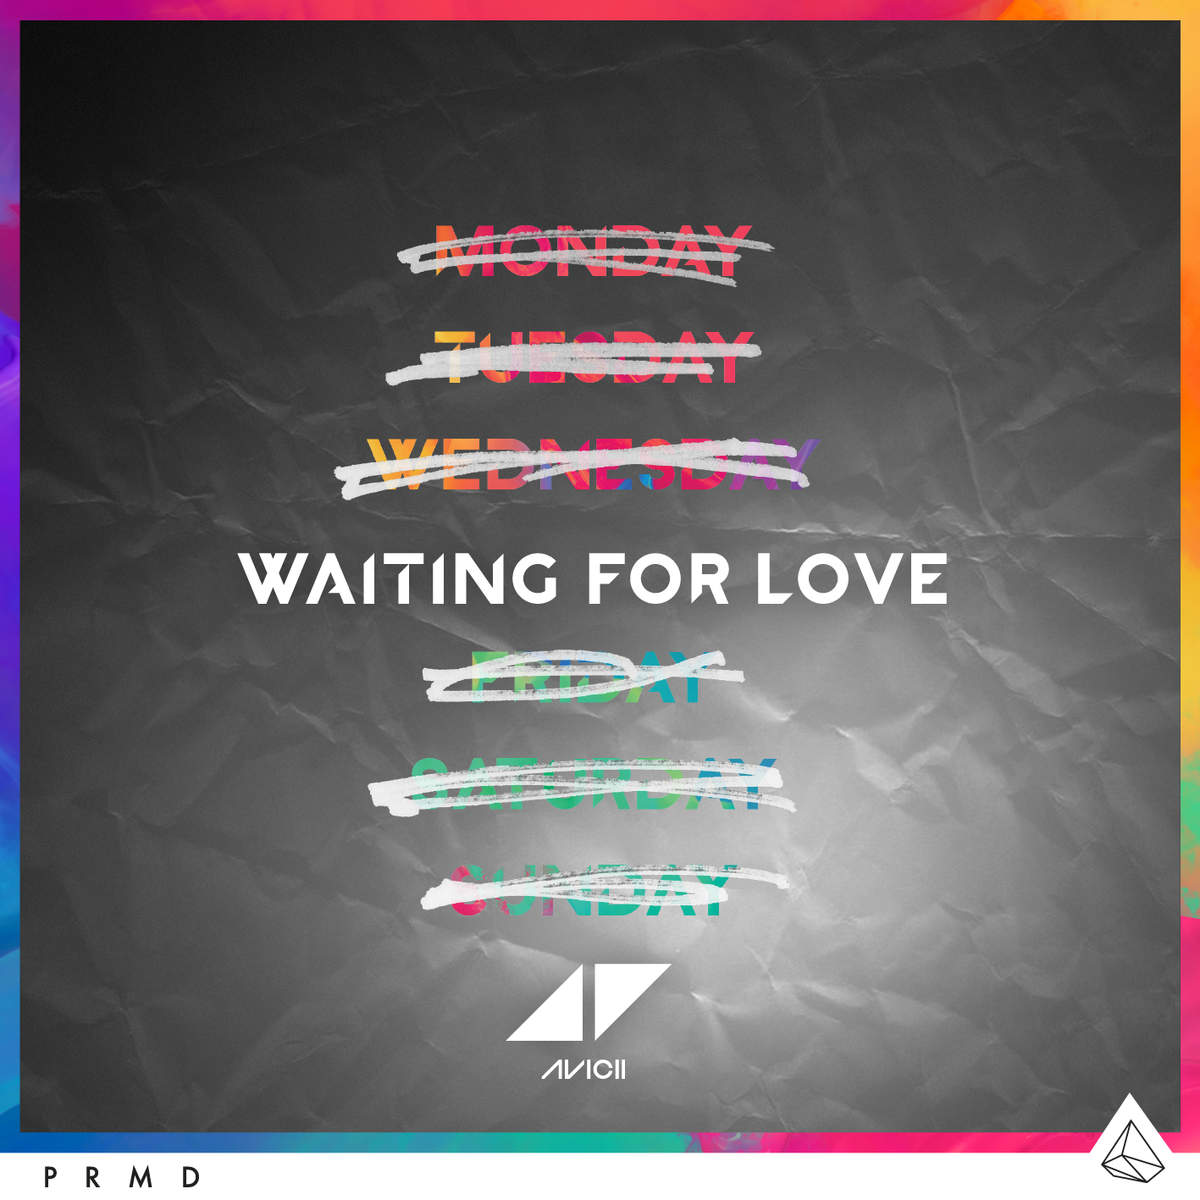 Avicii waiting for love 2015 1200x1200